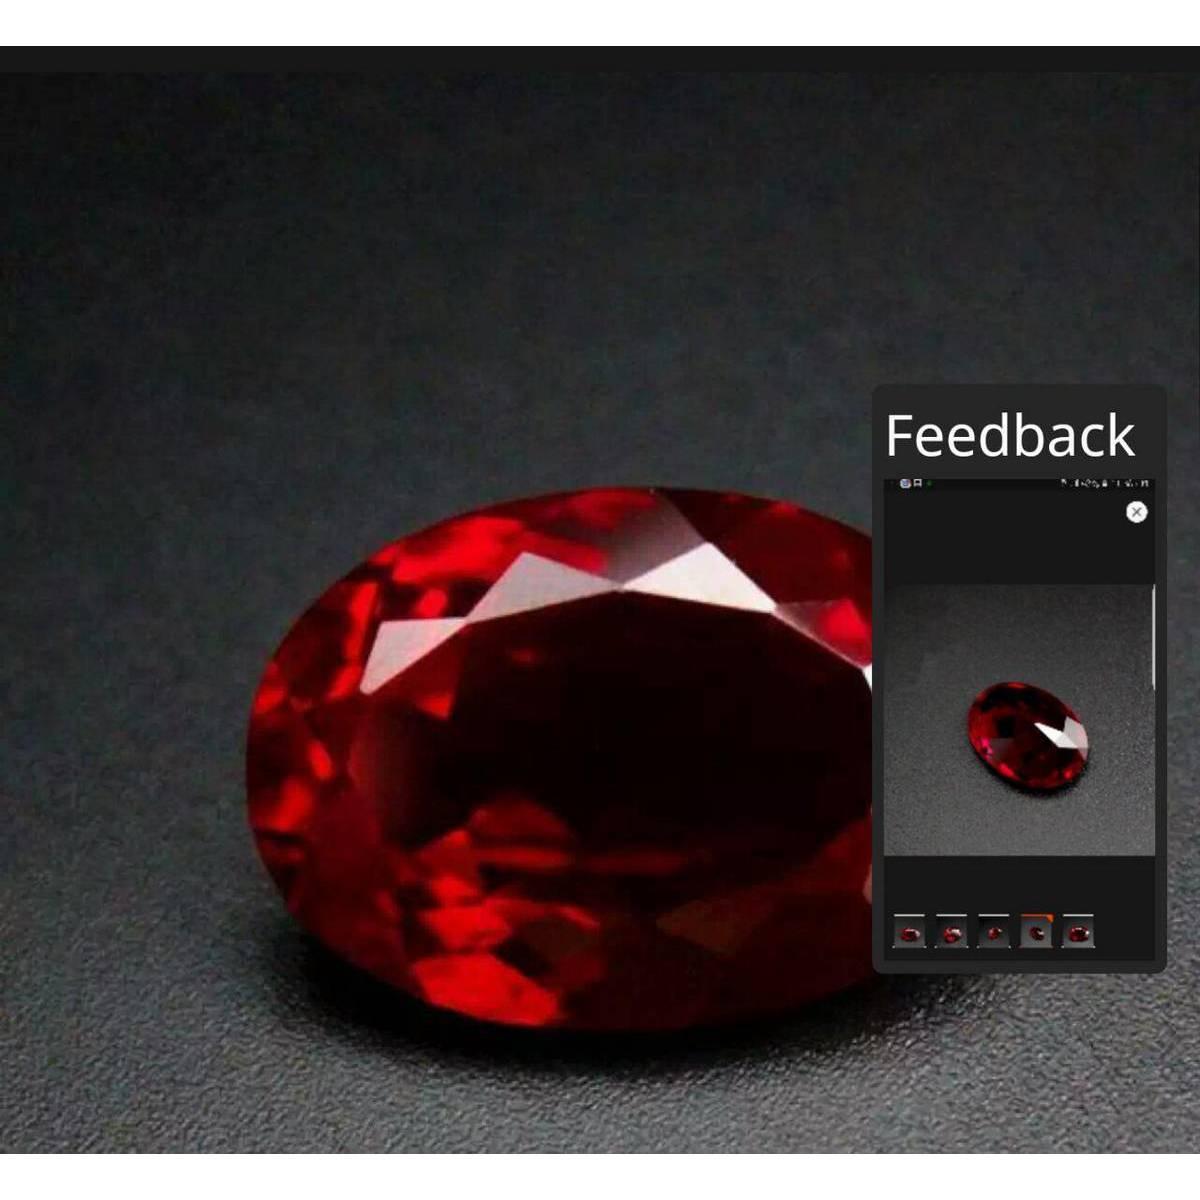 Anari Yaqoot Ruby Gemstone Weight 6.35 Carat With Free Surprise Gift